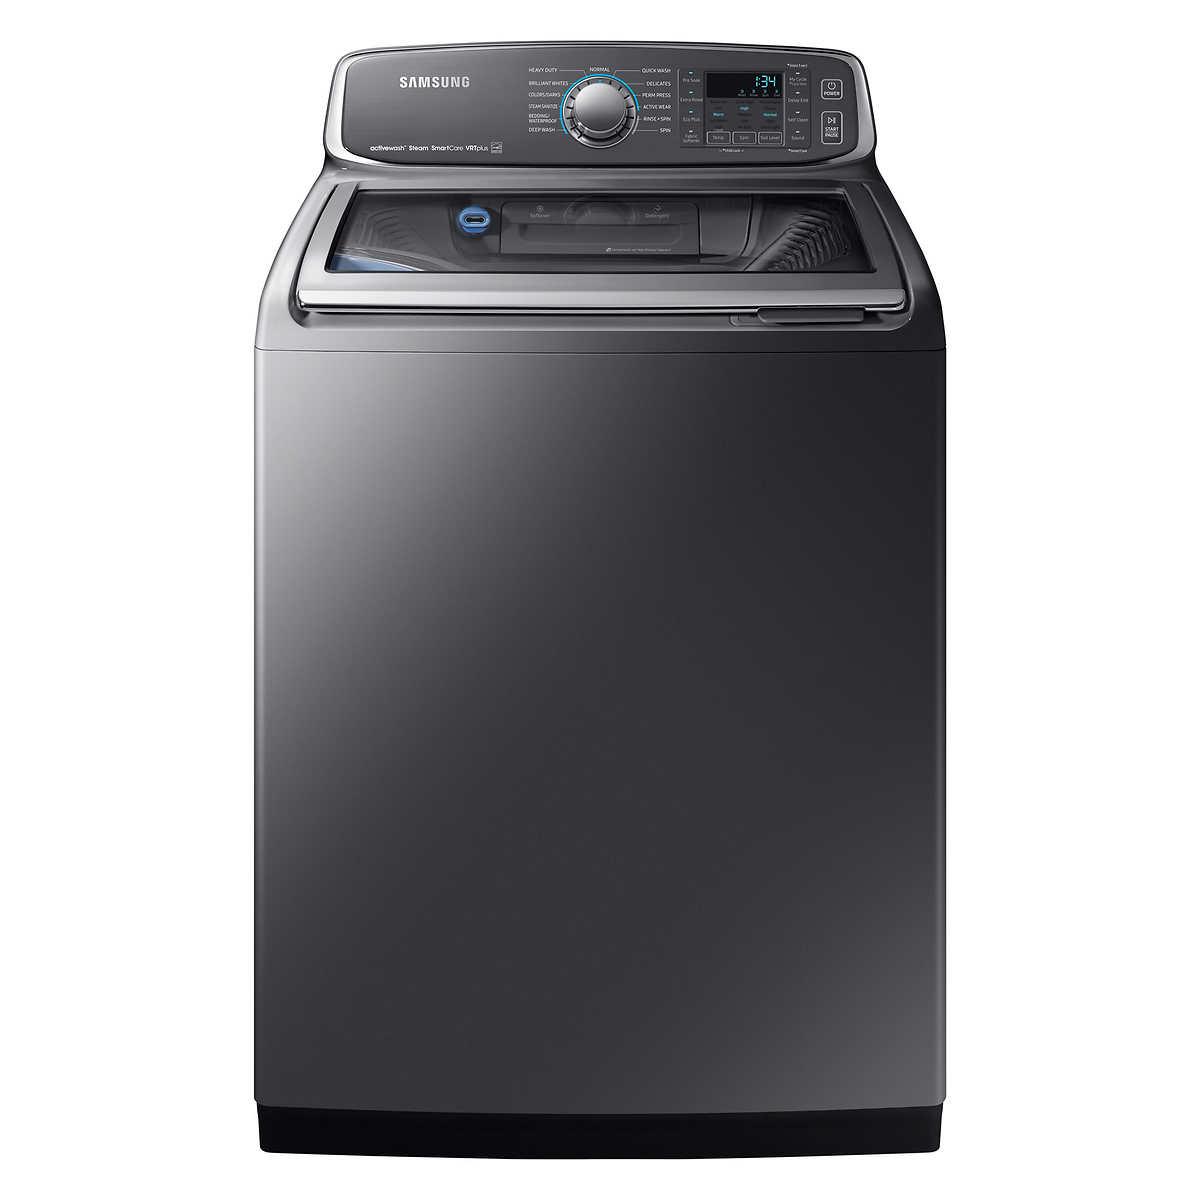 Samsung 6 cu  ft  Platinum Top-load Washer with Activewash